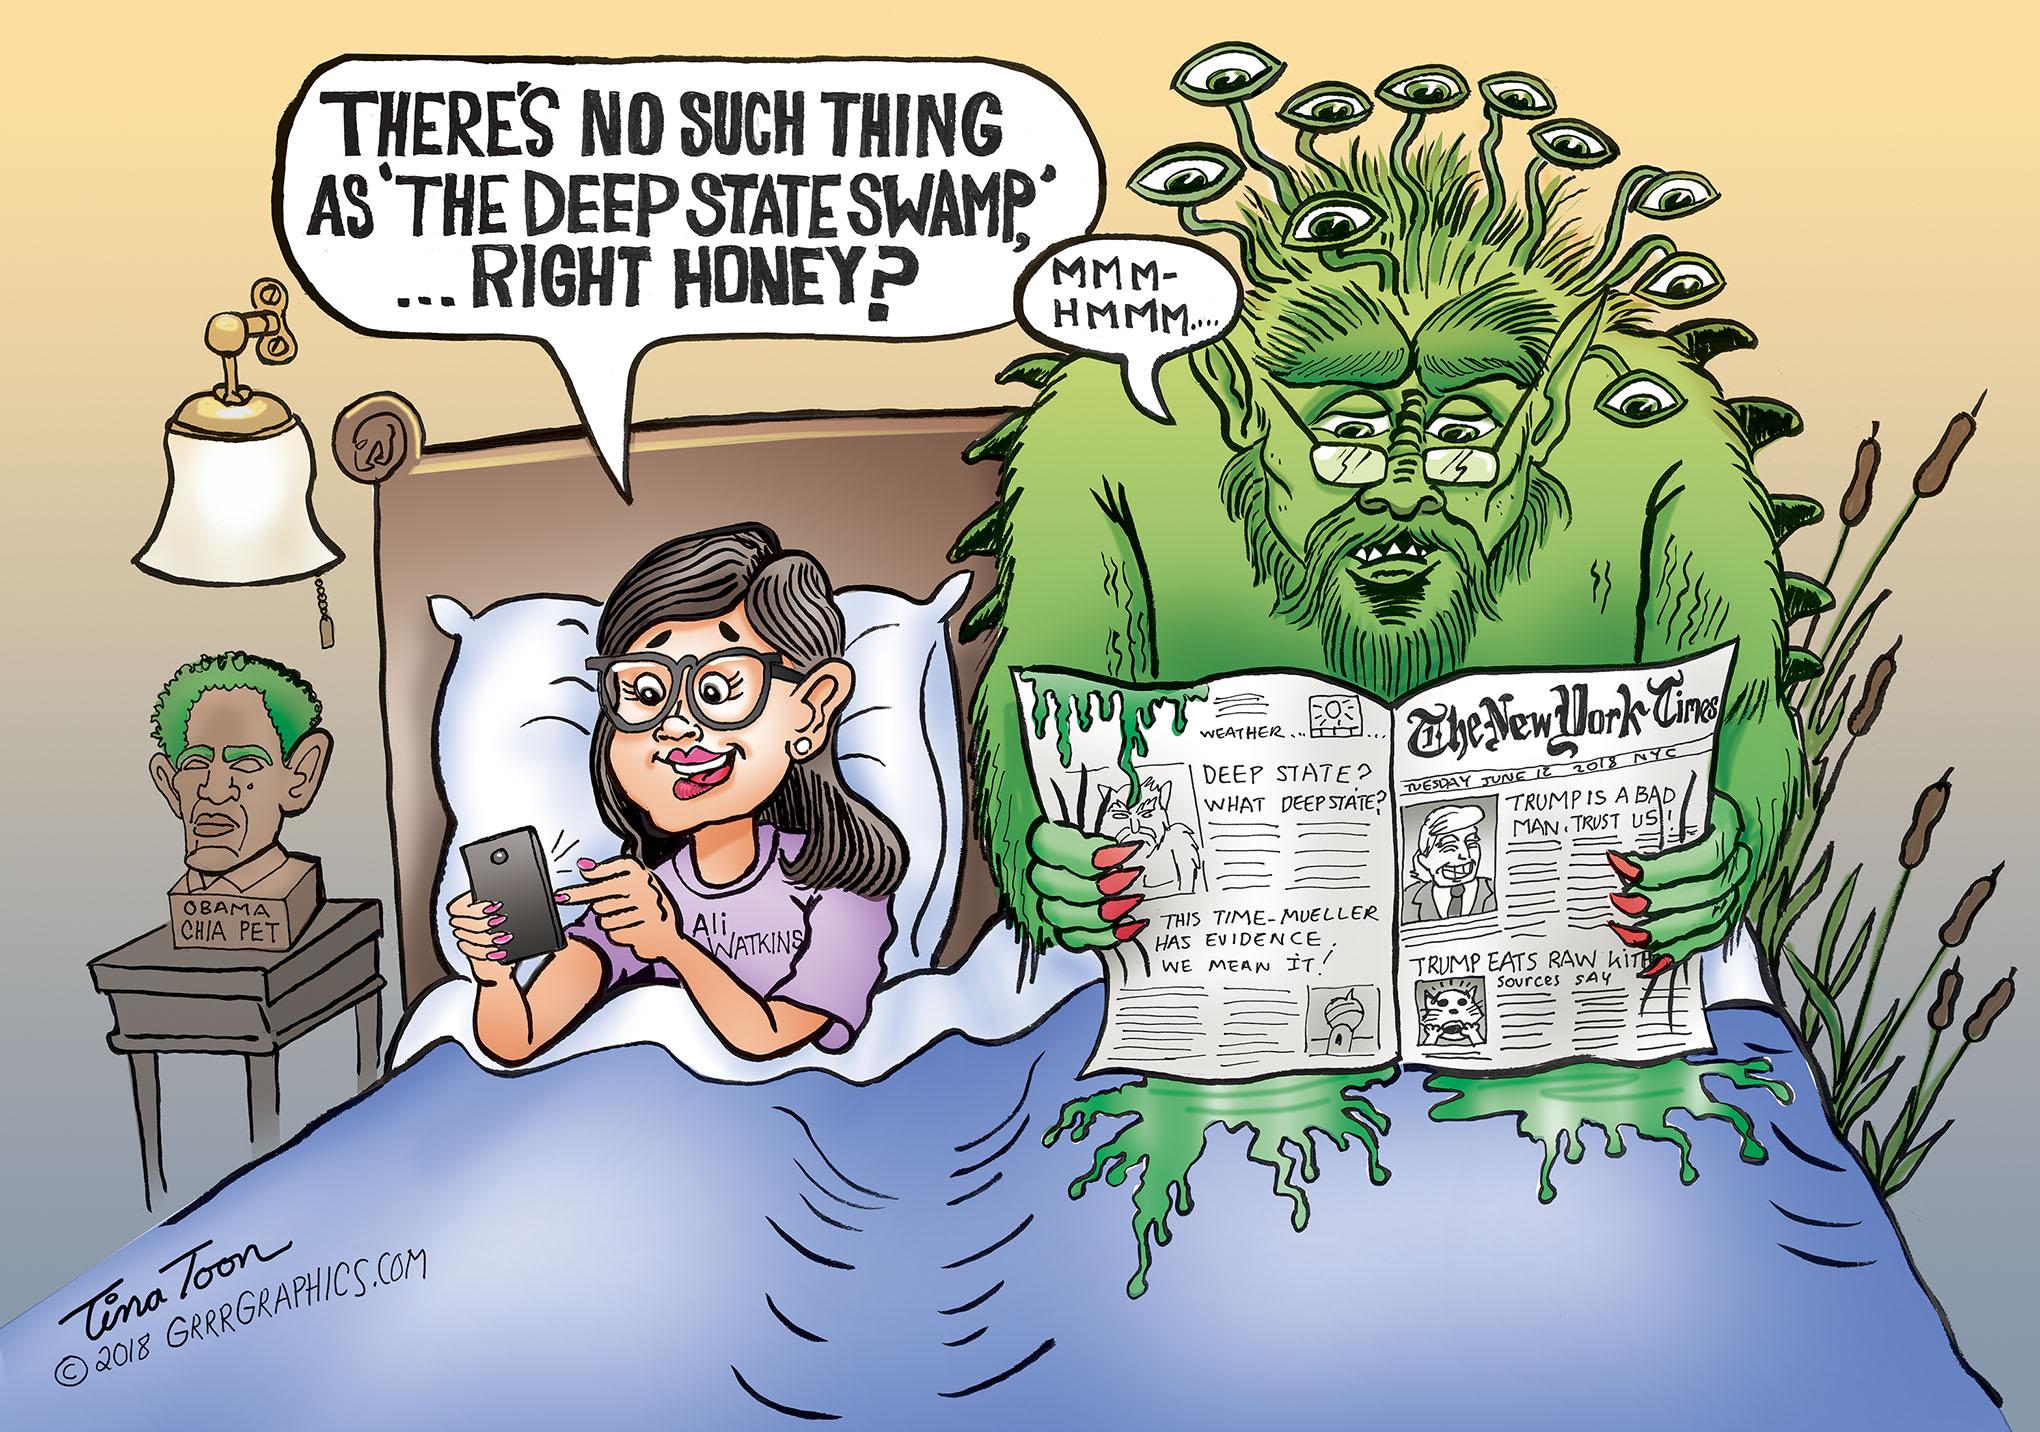 watkins_swamp_tina_toon.jpg